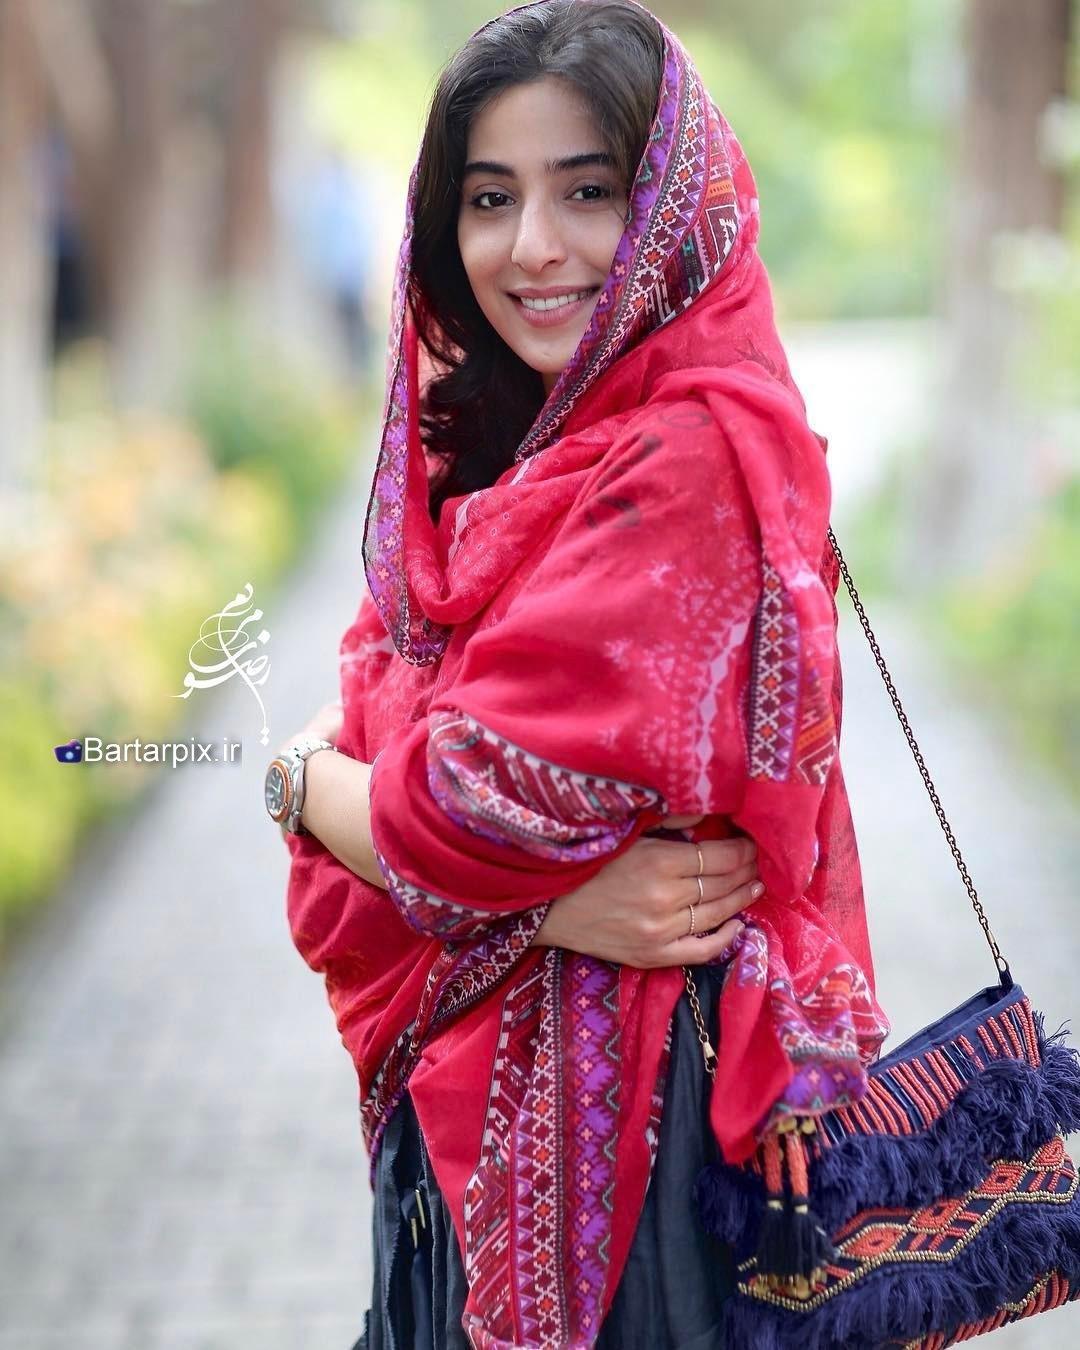 http://s9.picofile.com/file/8295201234/www_bartarpix_ir_anahita_afshar_sal_1396_1_.jpg